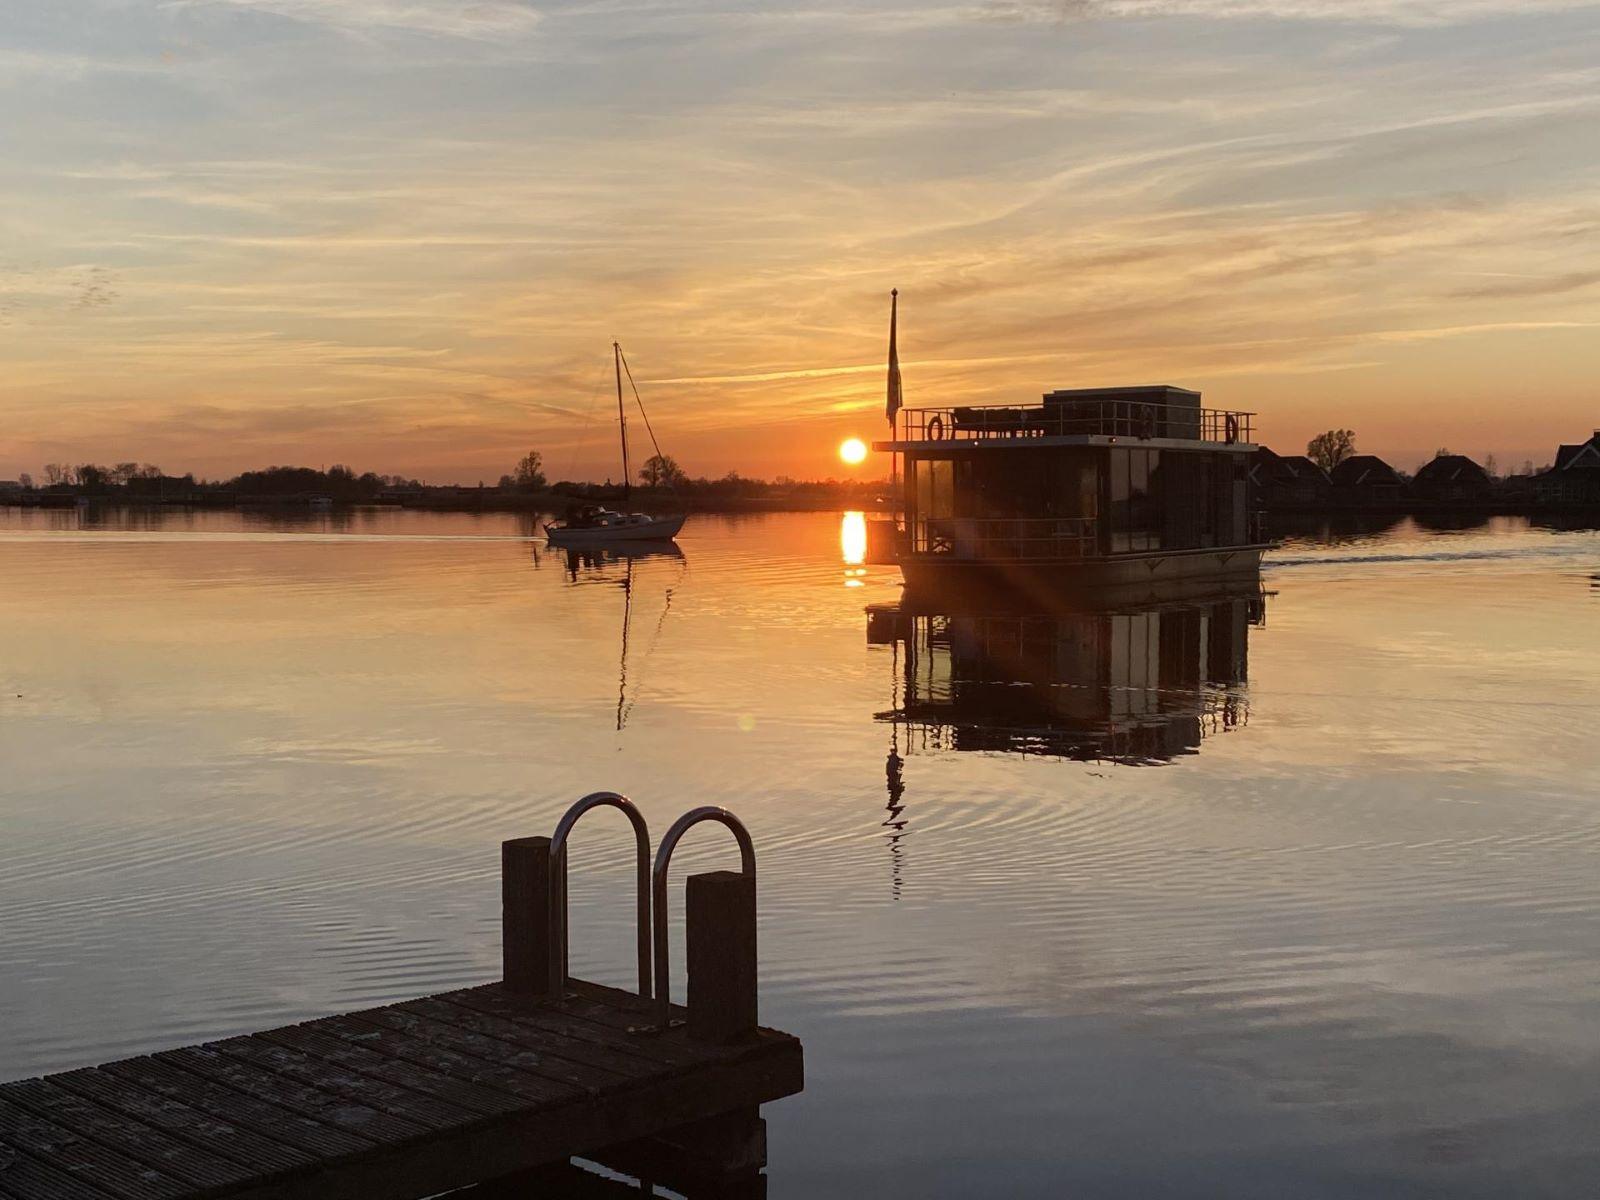 Supertrips - Woonboot op het water in Friesland